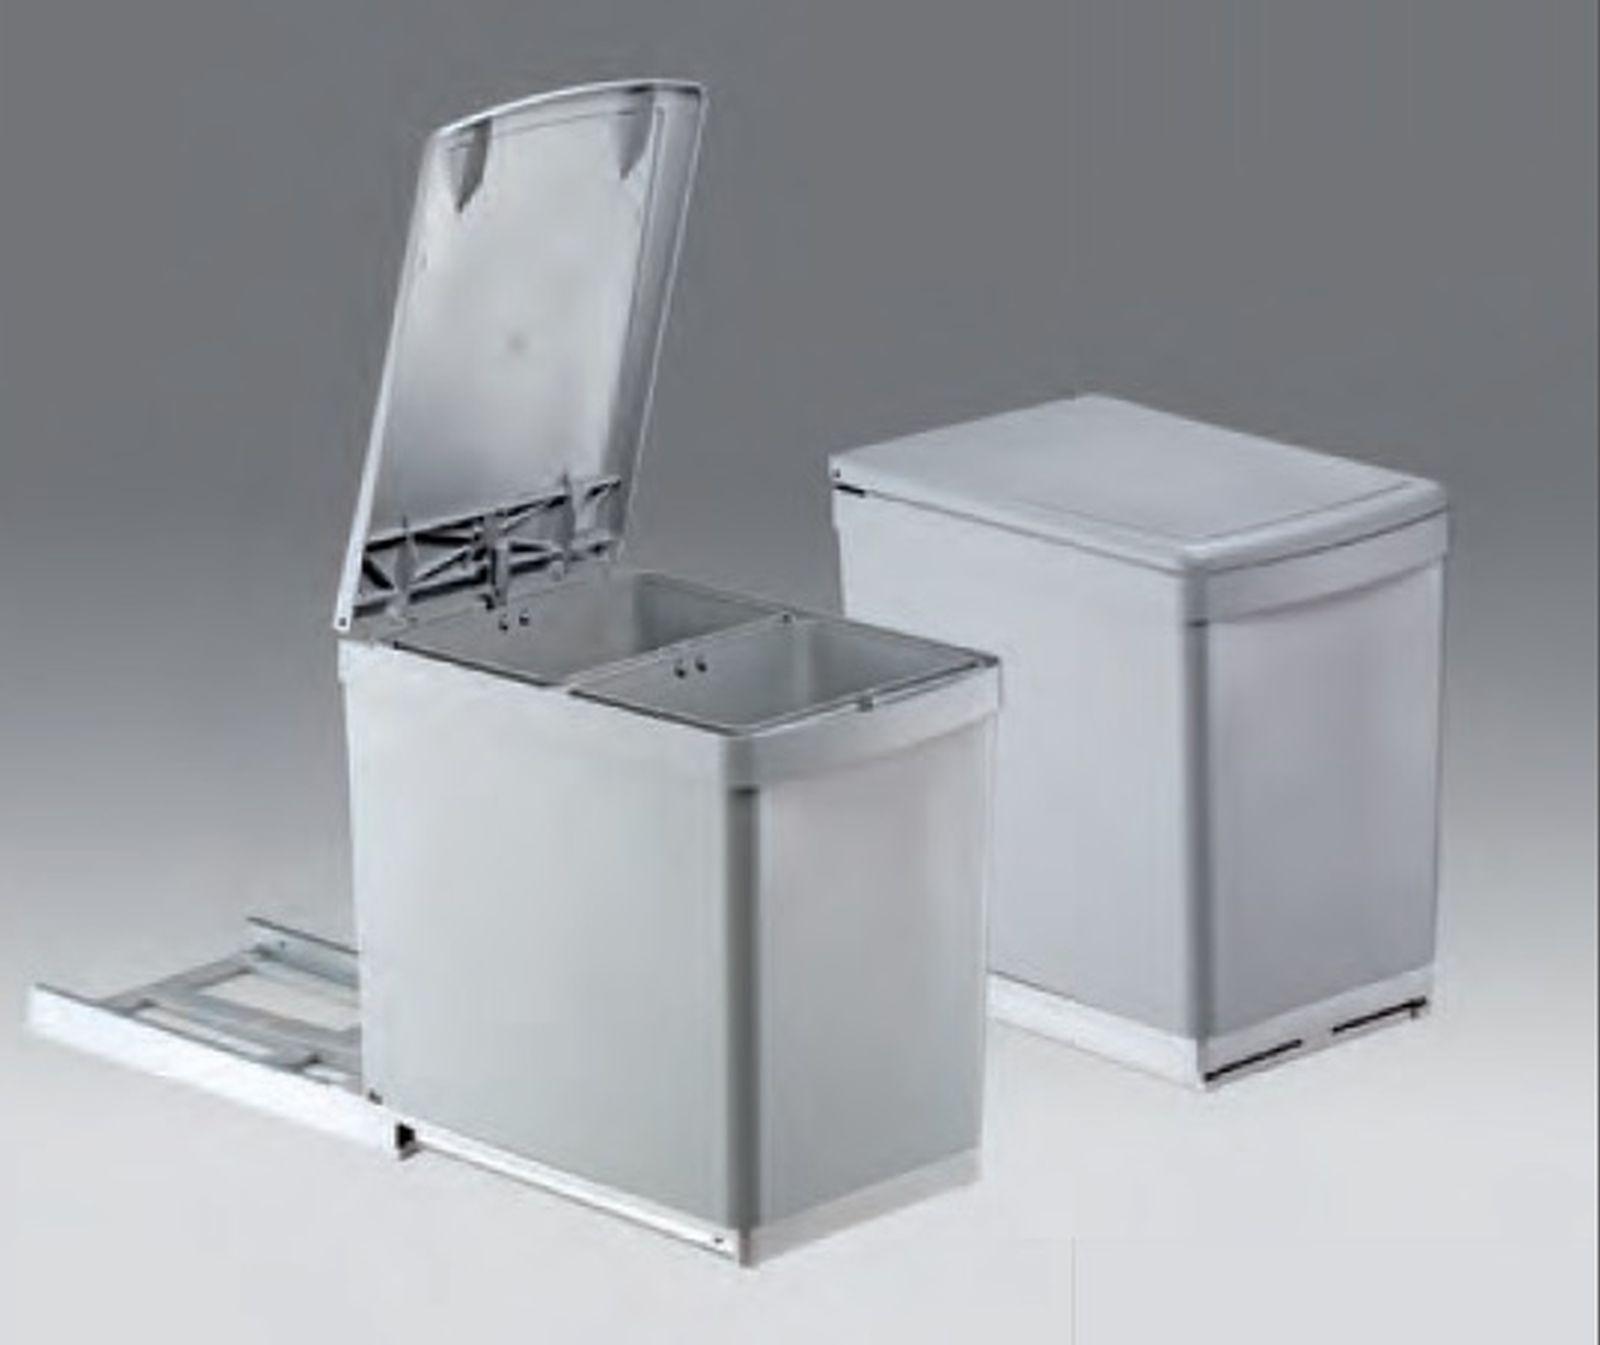 Wesco Basic 2 Vollauszug 2 x 7 5 L Abfall Mülleimer 30